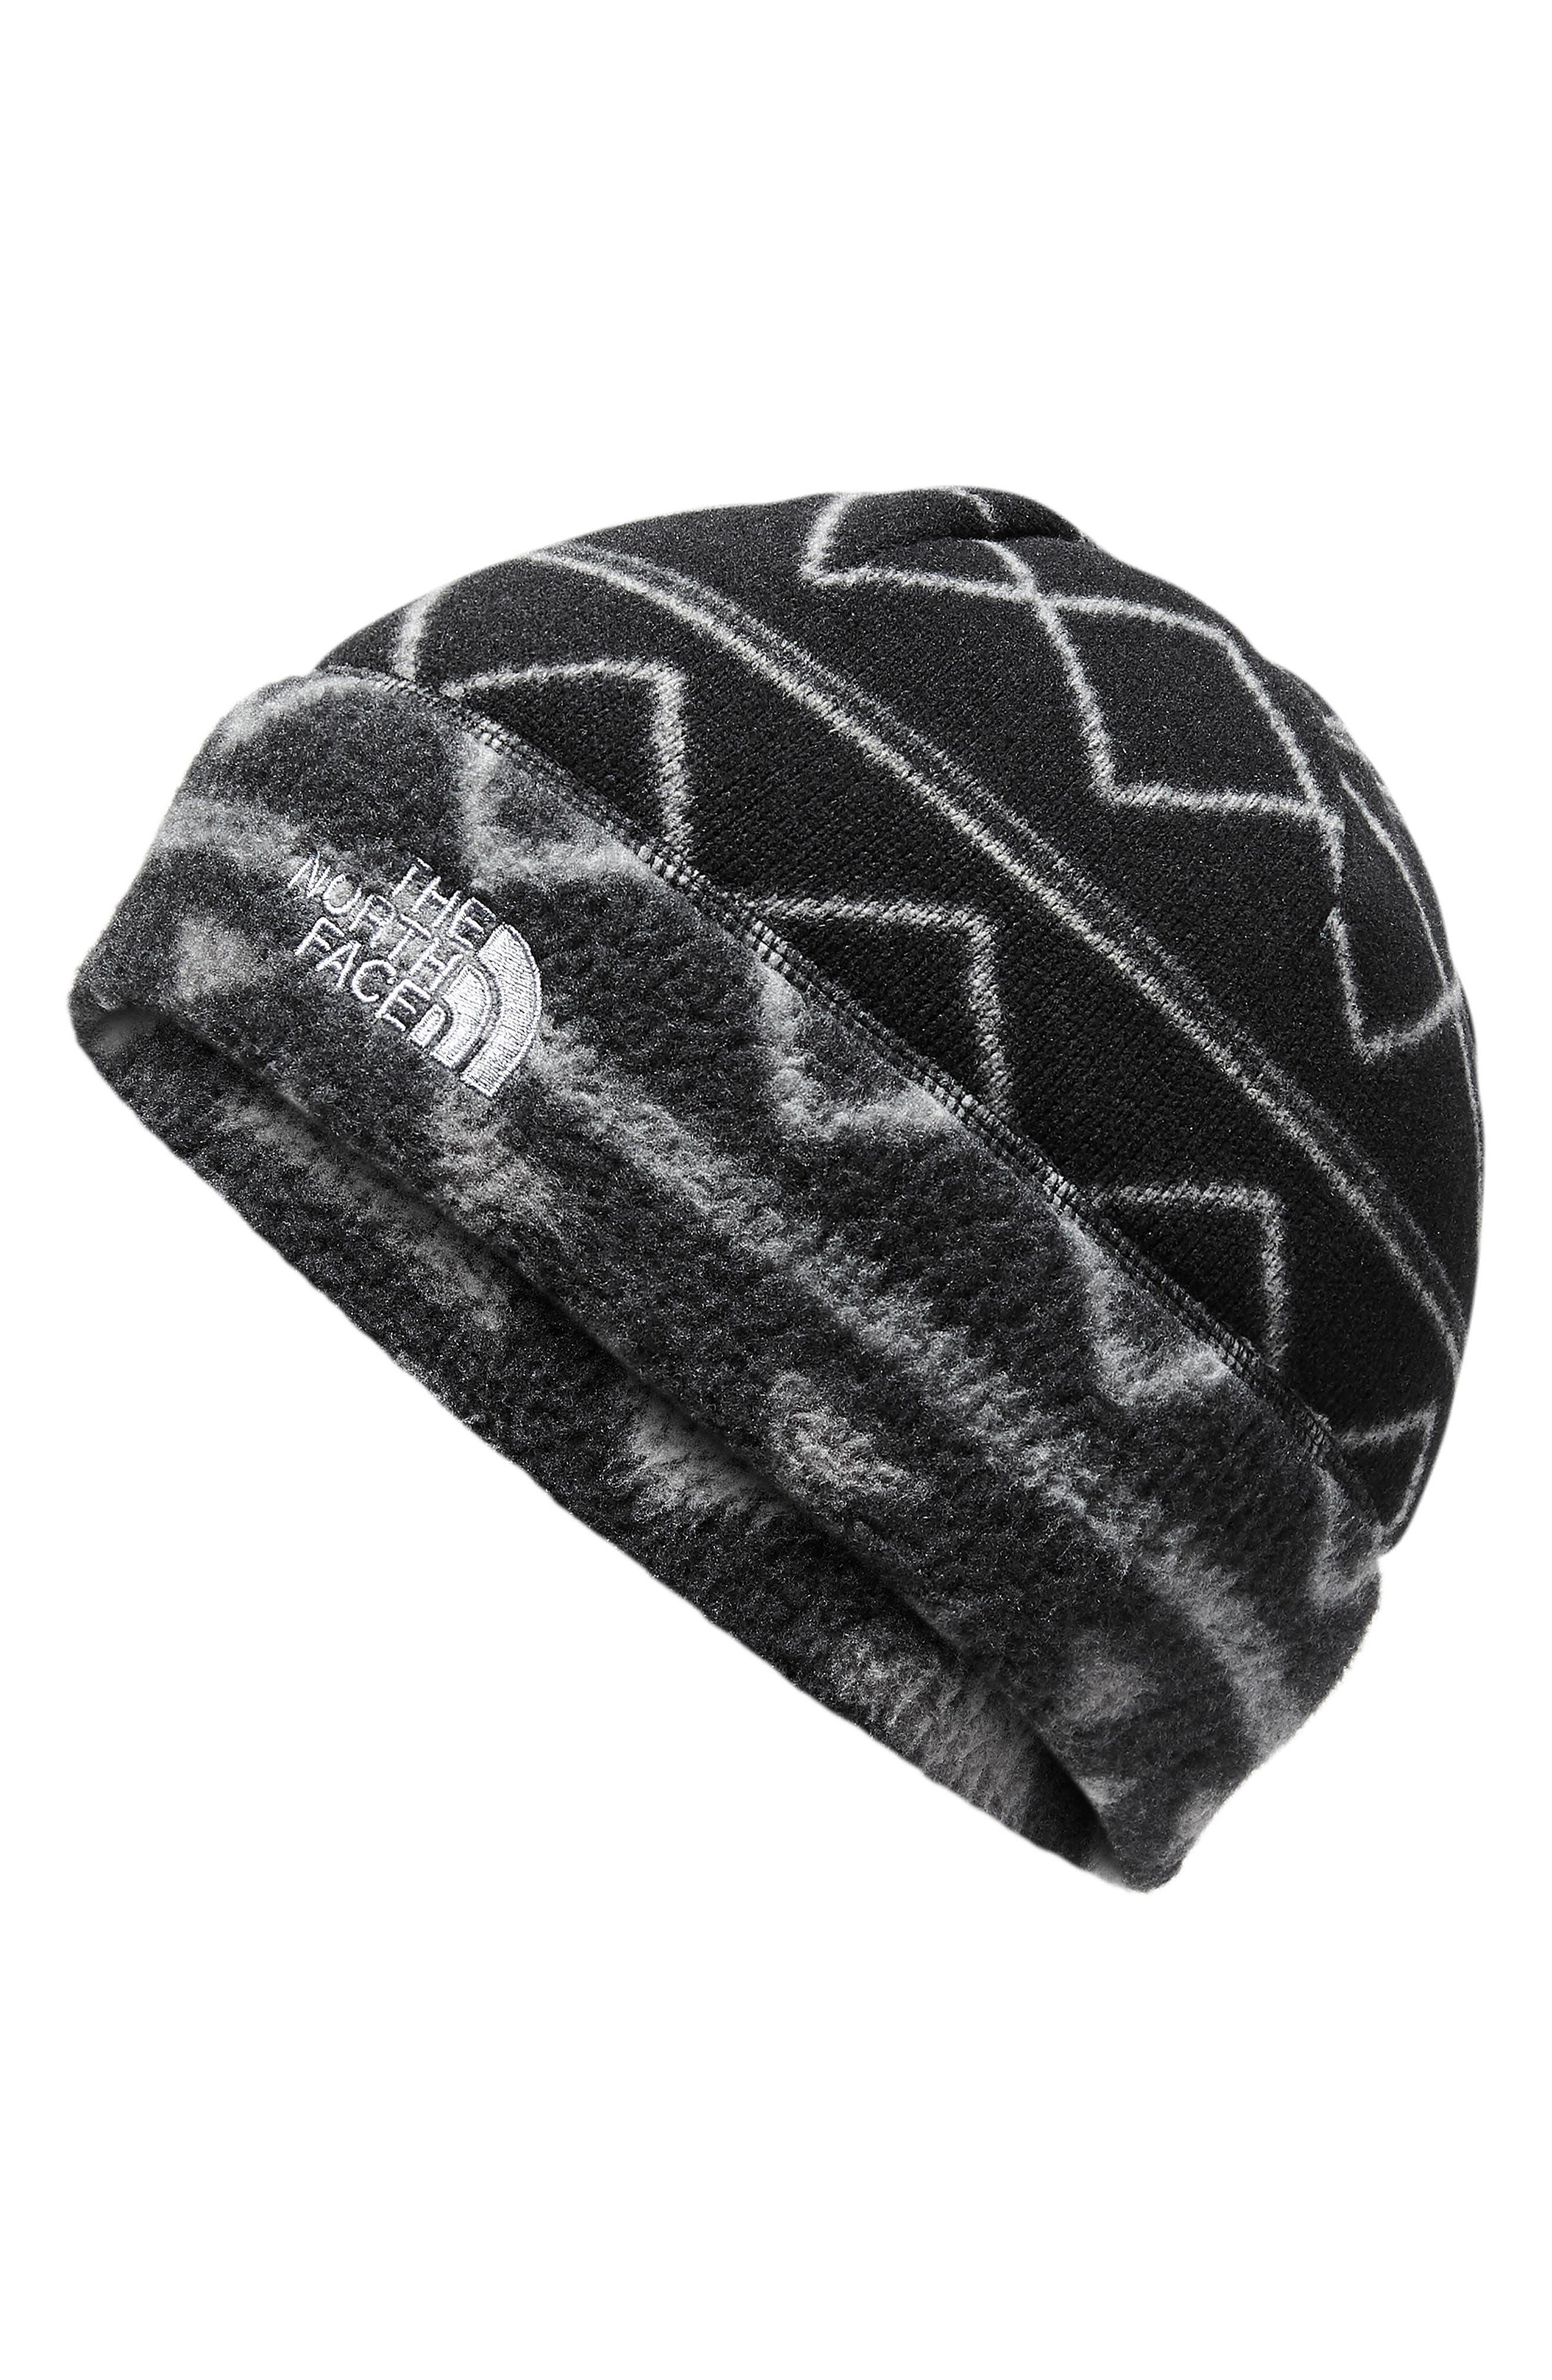 The North Face Sweater Fleece Beanie - Black